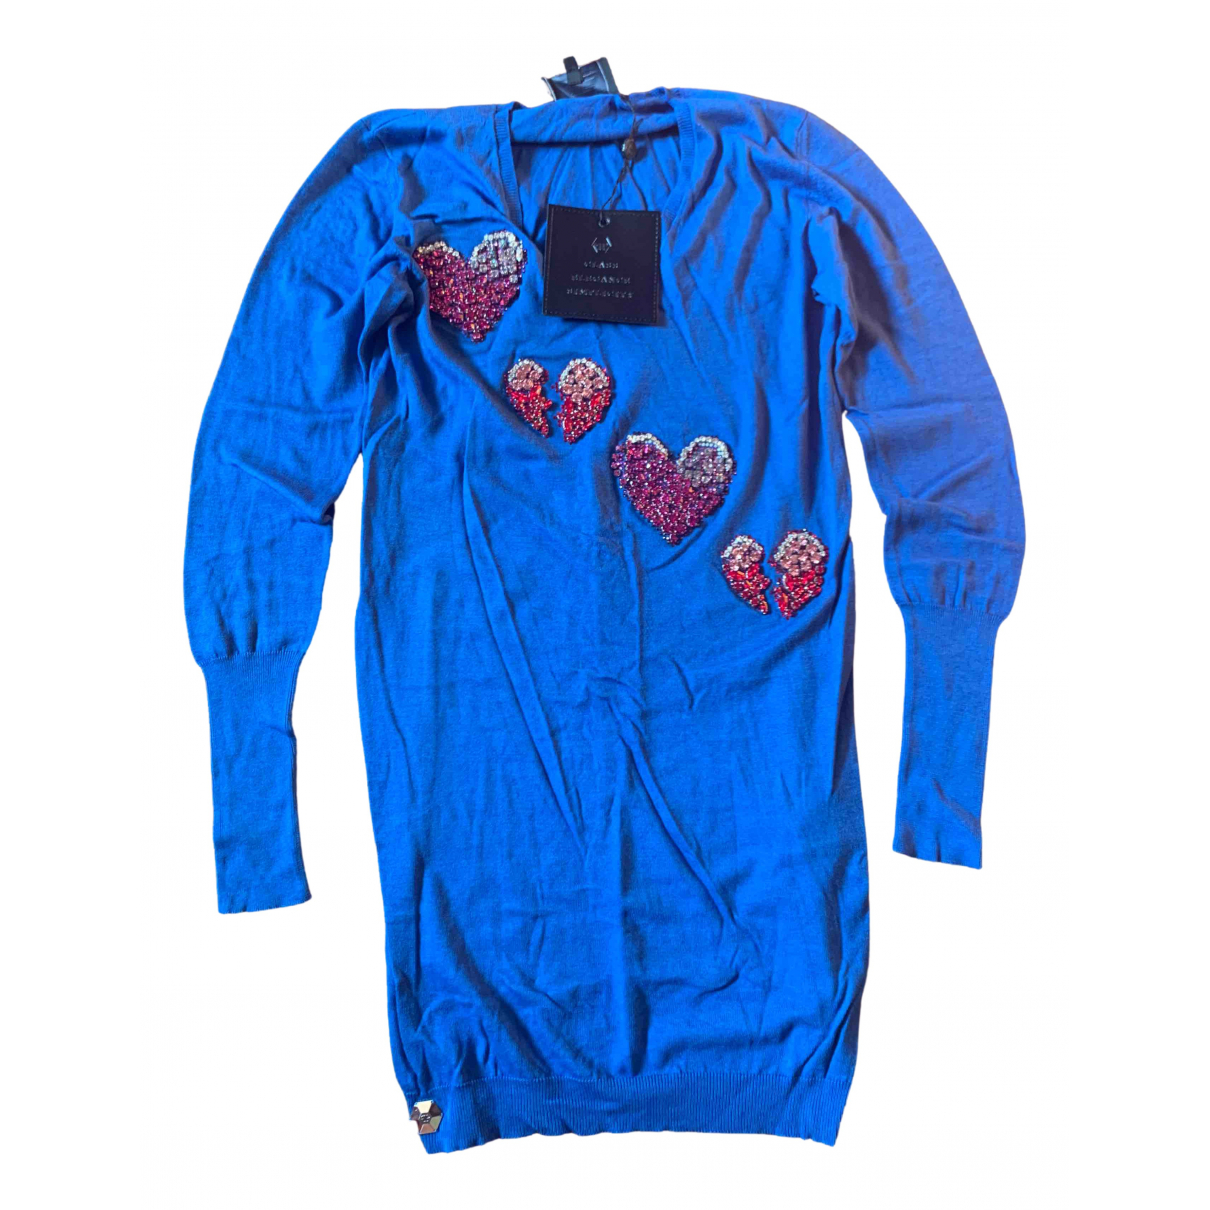 Philipp Plein \N Blue Cotton dress for Women S International